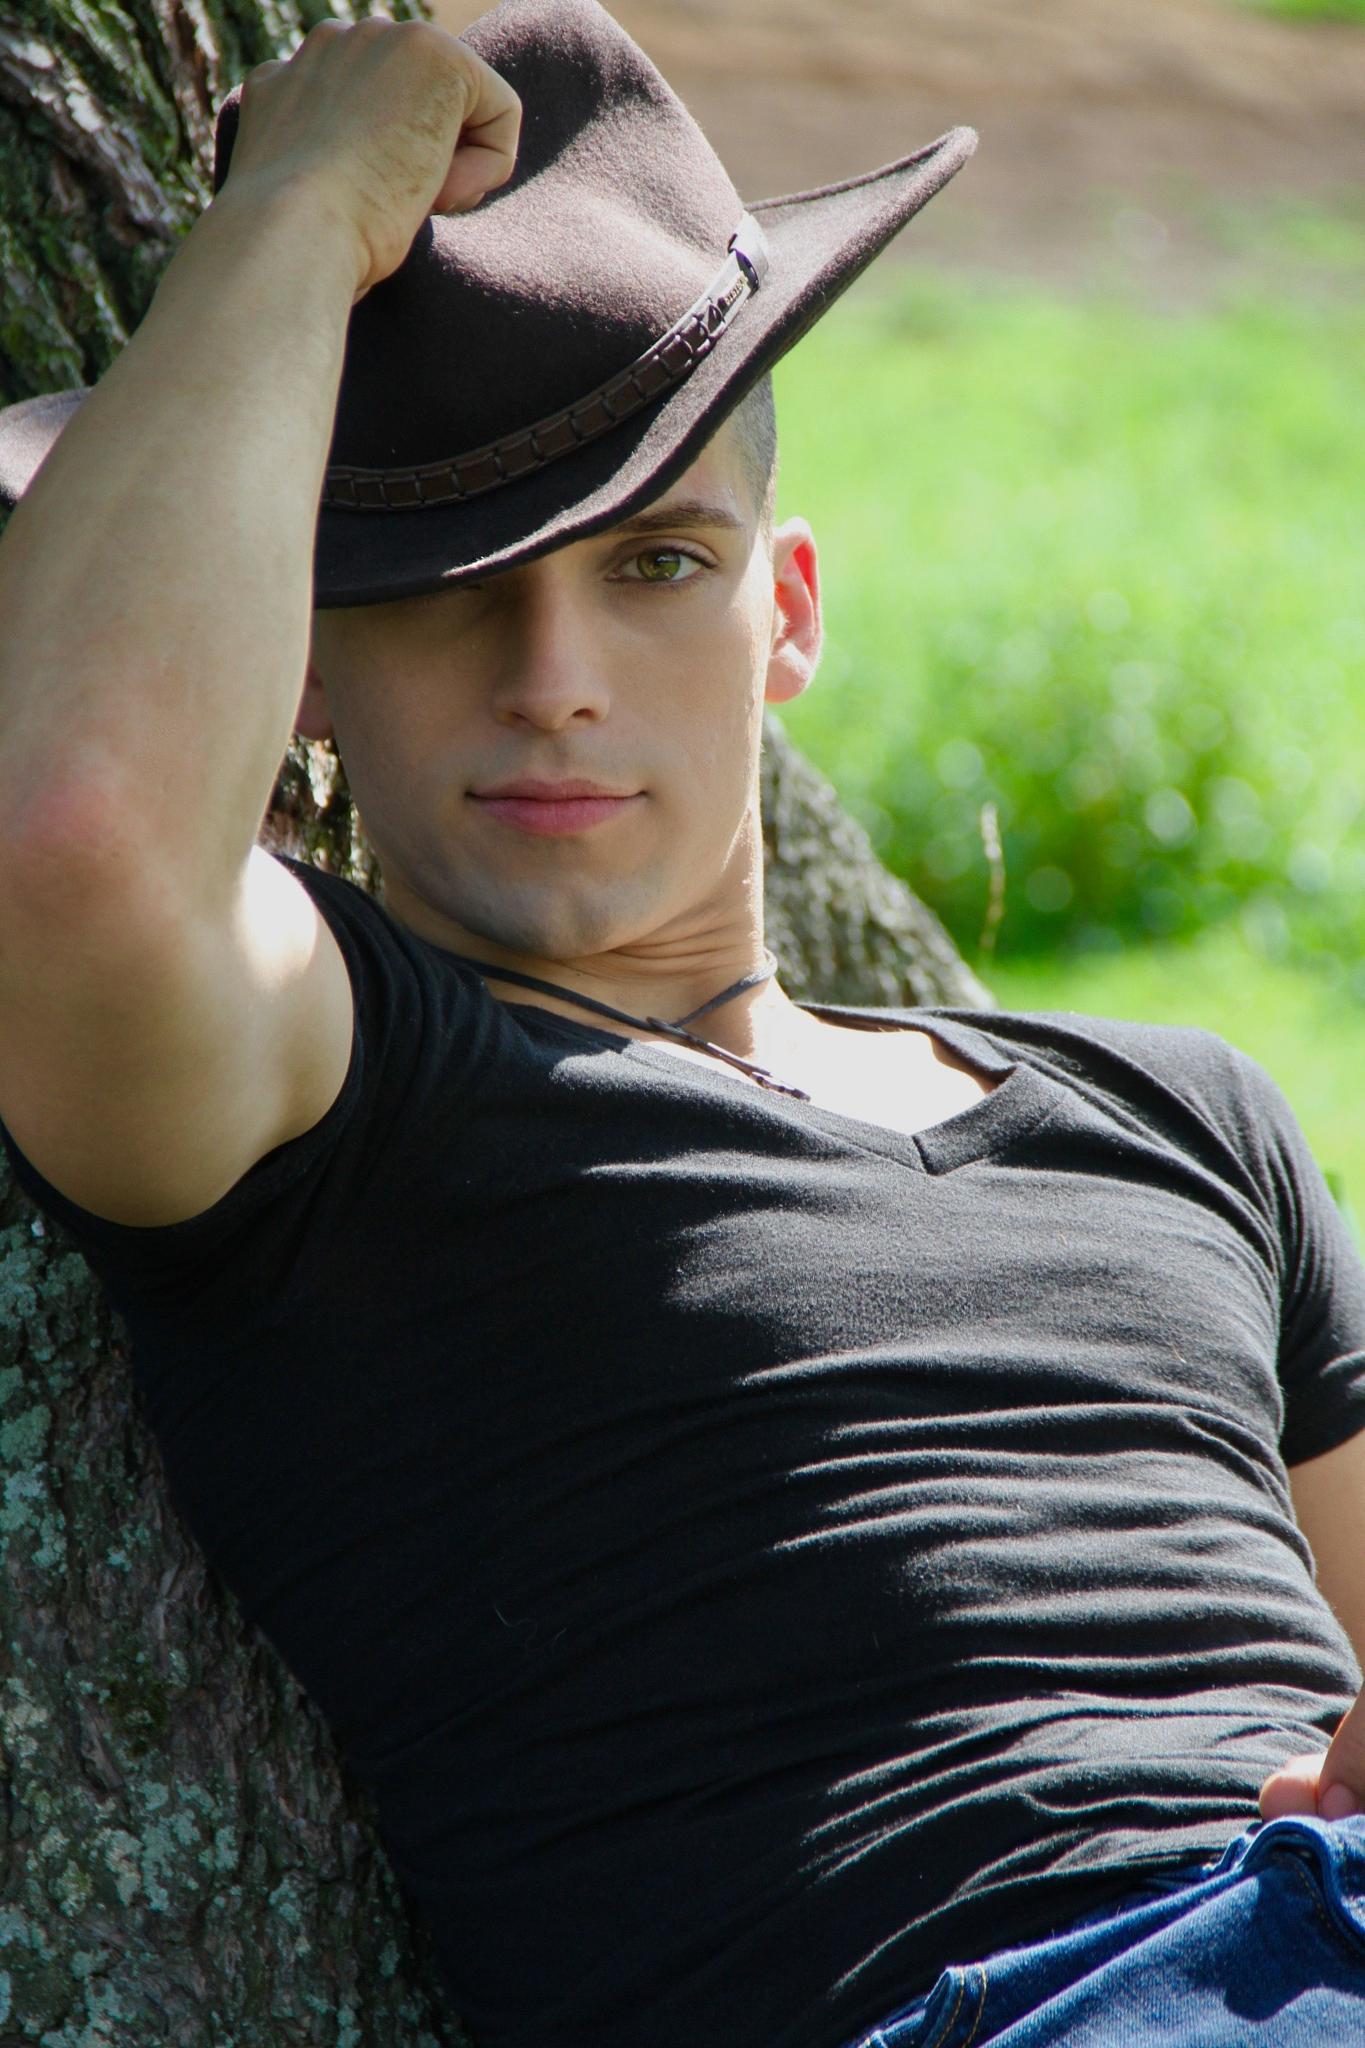 Michael Jade Paquette - Model by Jason R. Rich